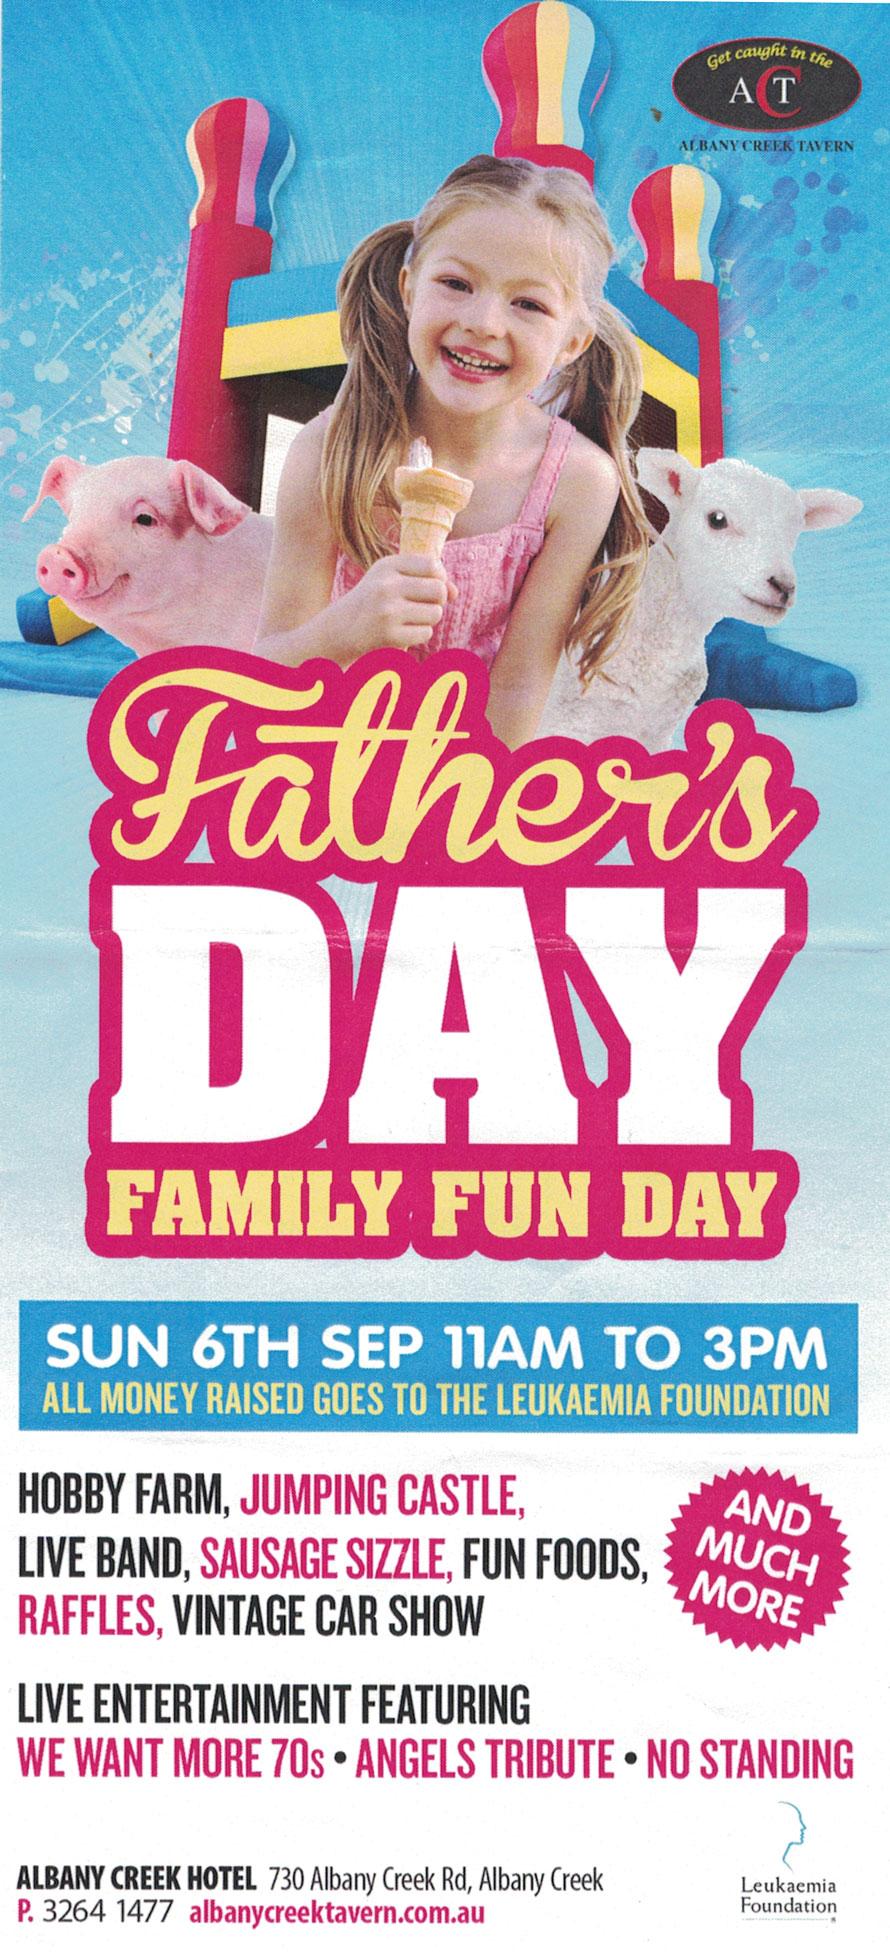 2015 Father's Day Family Fun Day @ Albany Creek Tavern | Albany Creek | Queensland | Australia